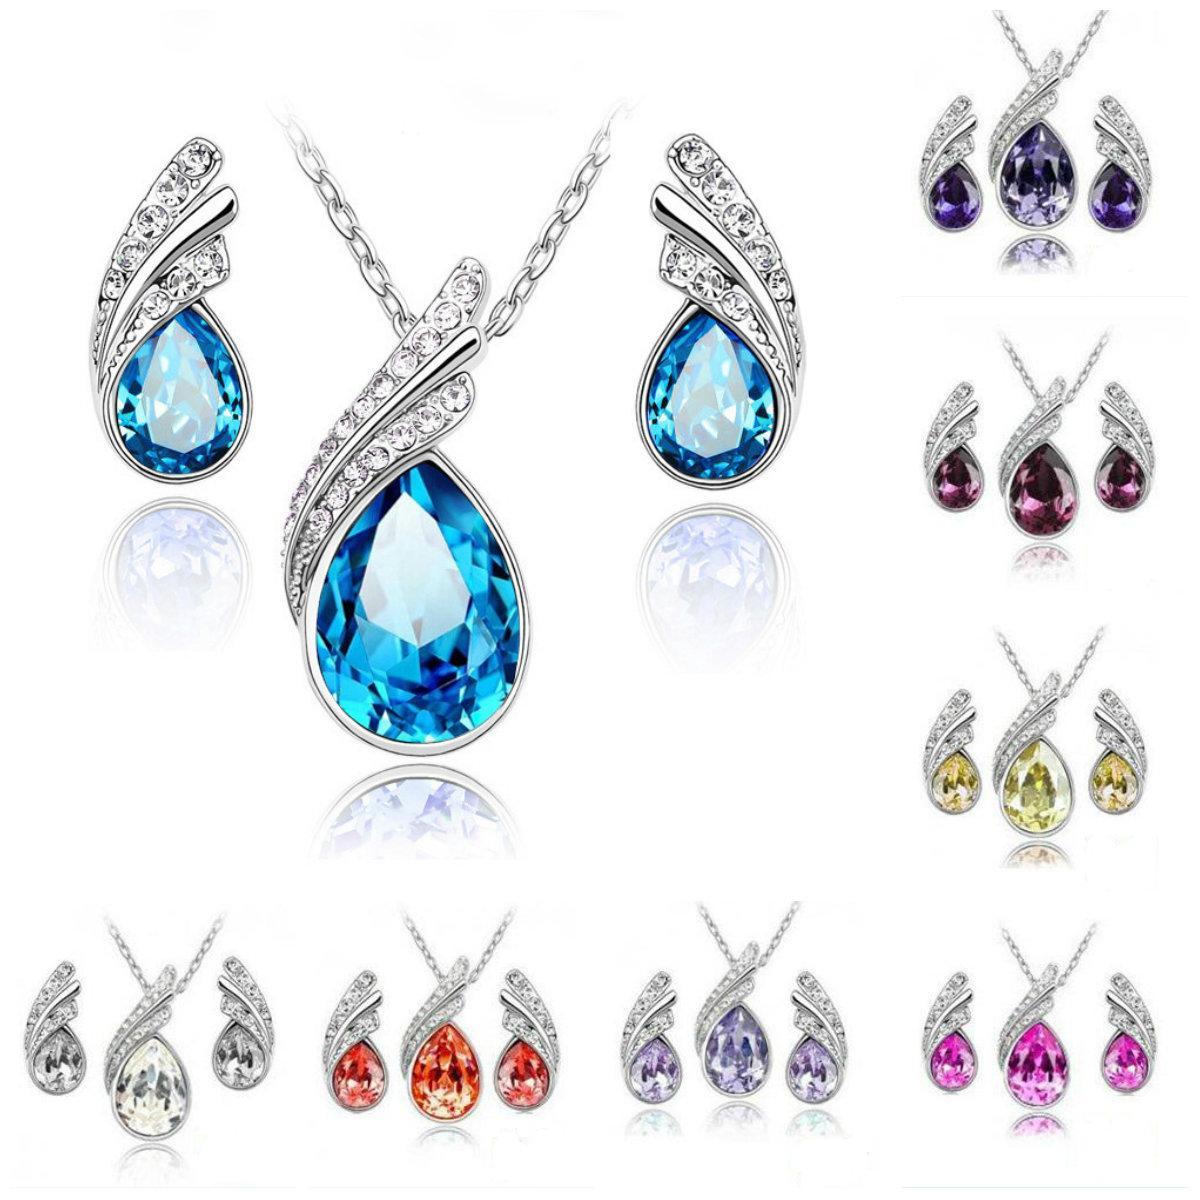 Bridesmaid Jewelry Sets Fashion Indian Wedding Jewelry Cheap